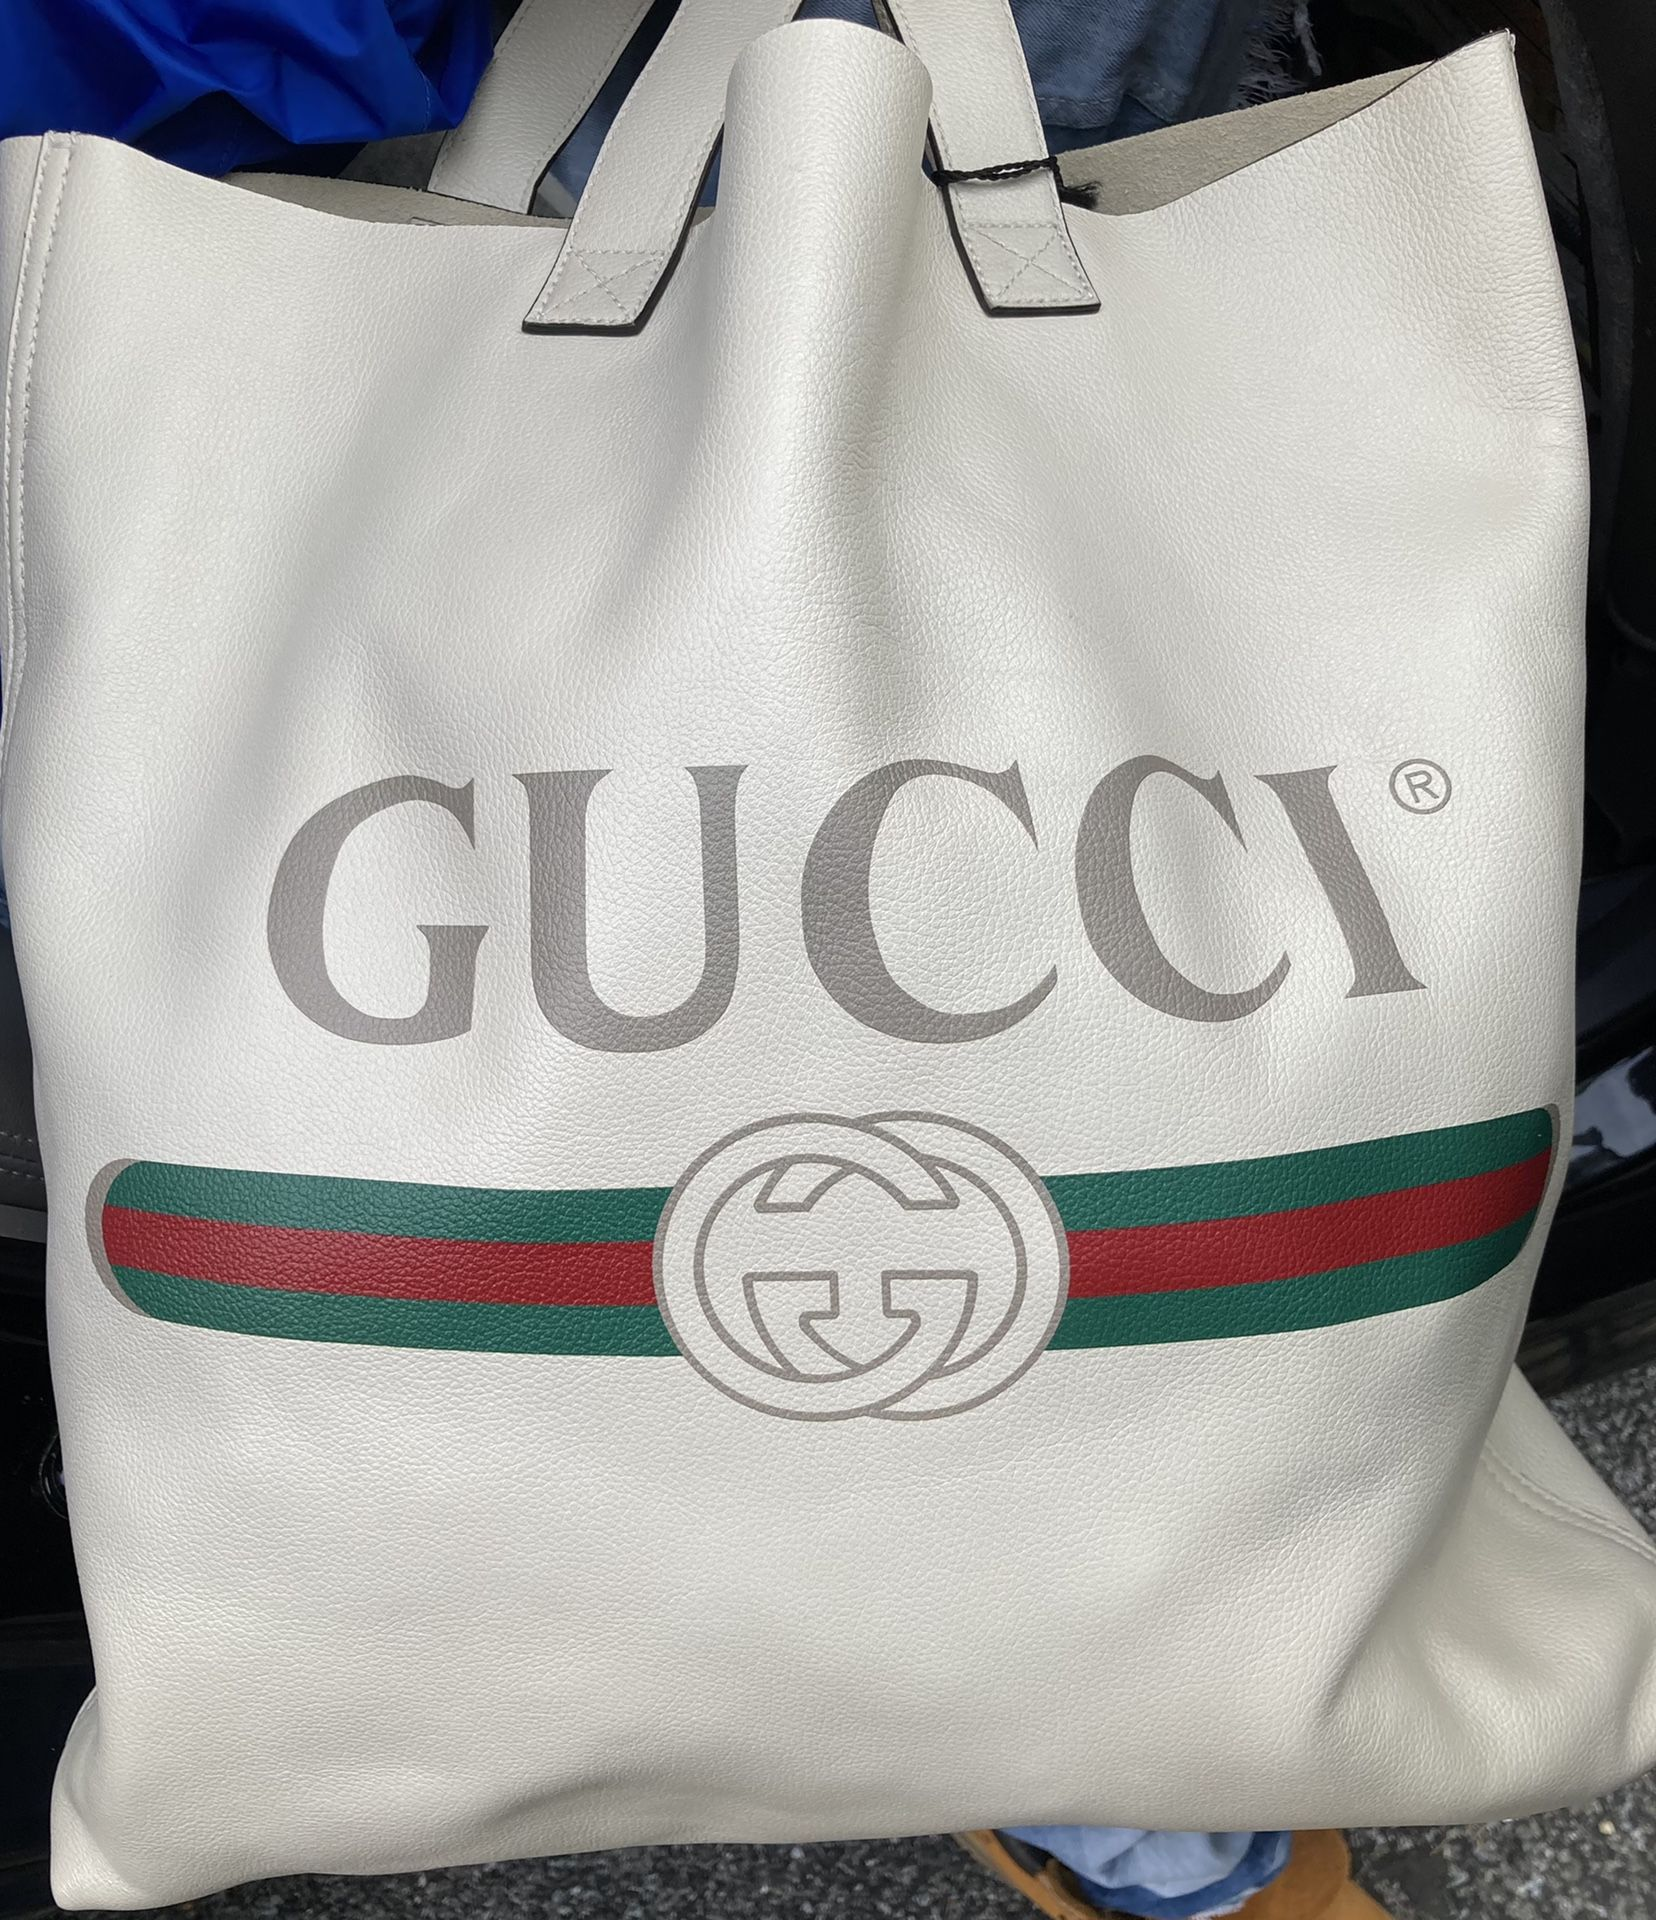 Gucci logo tote bag